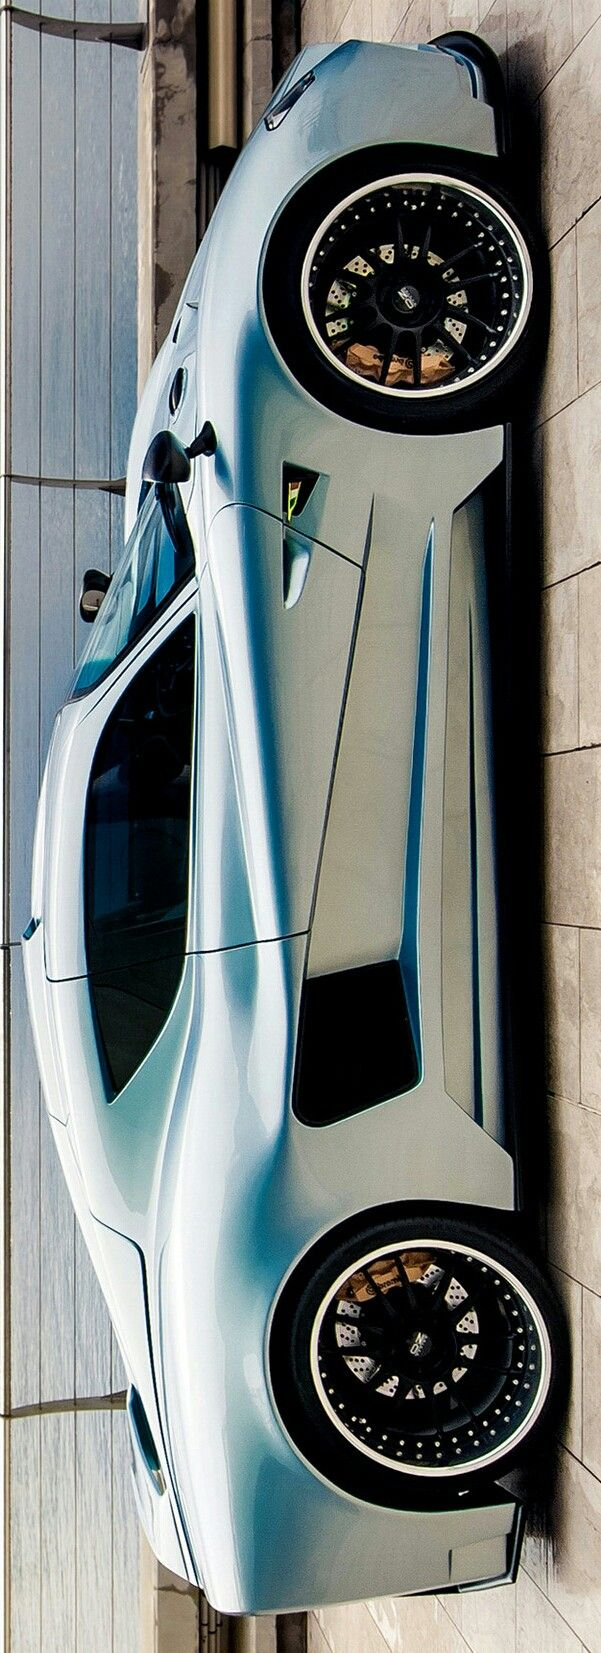 MAZZANTI EVANTRA V8 by Levon